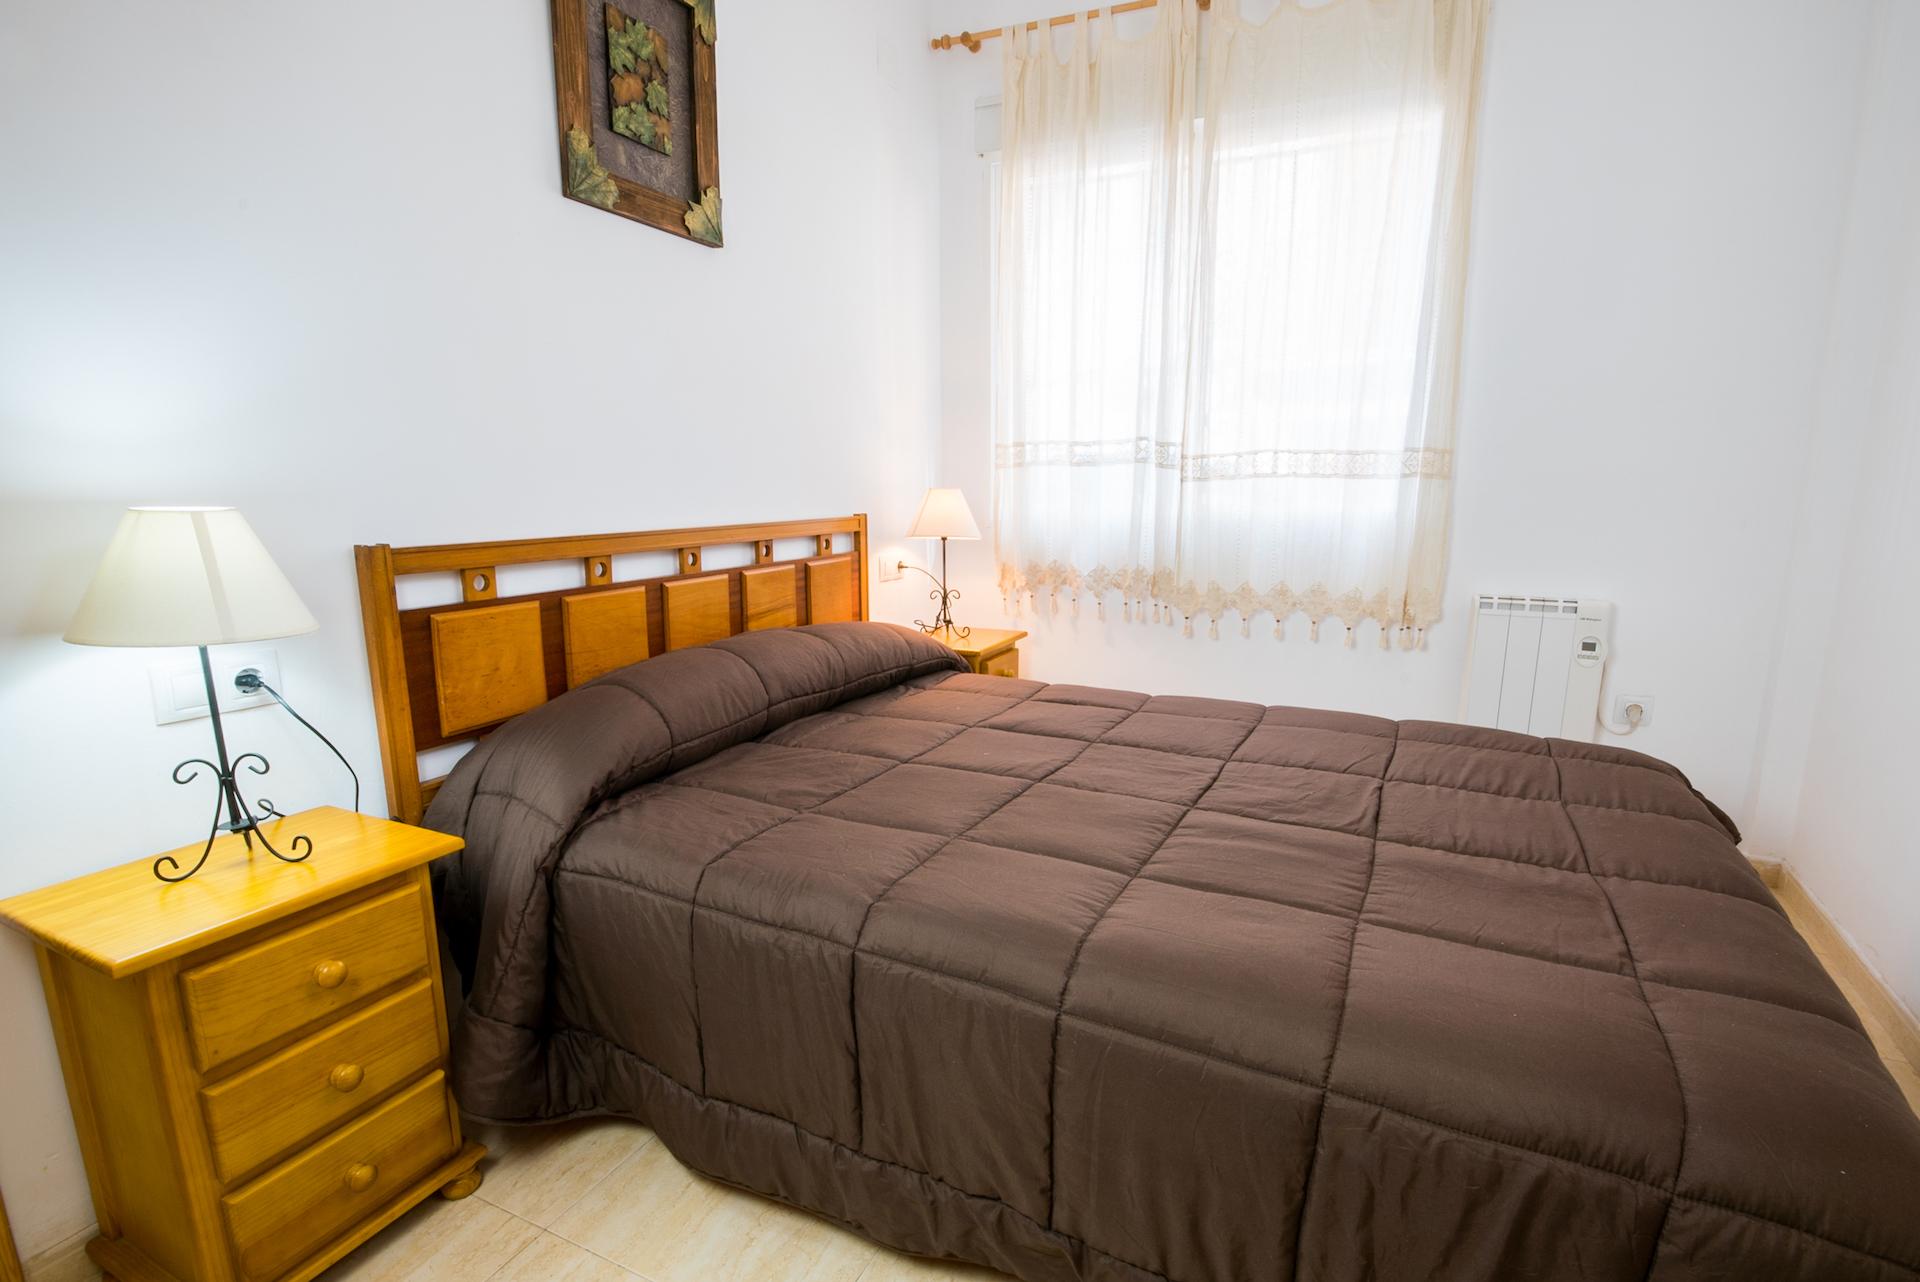 Apartamento Benafer Planta Baja - Habitación Matrimonio